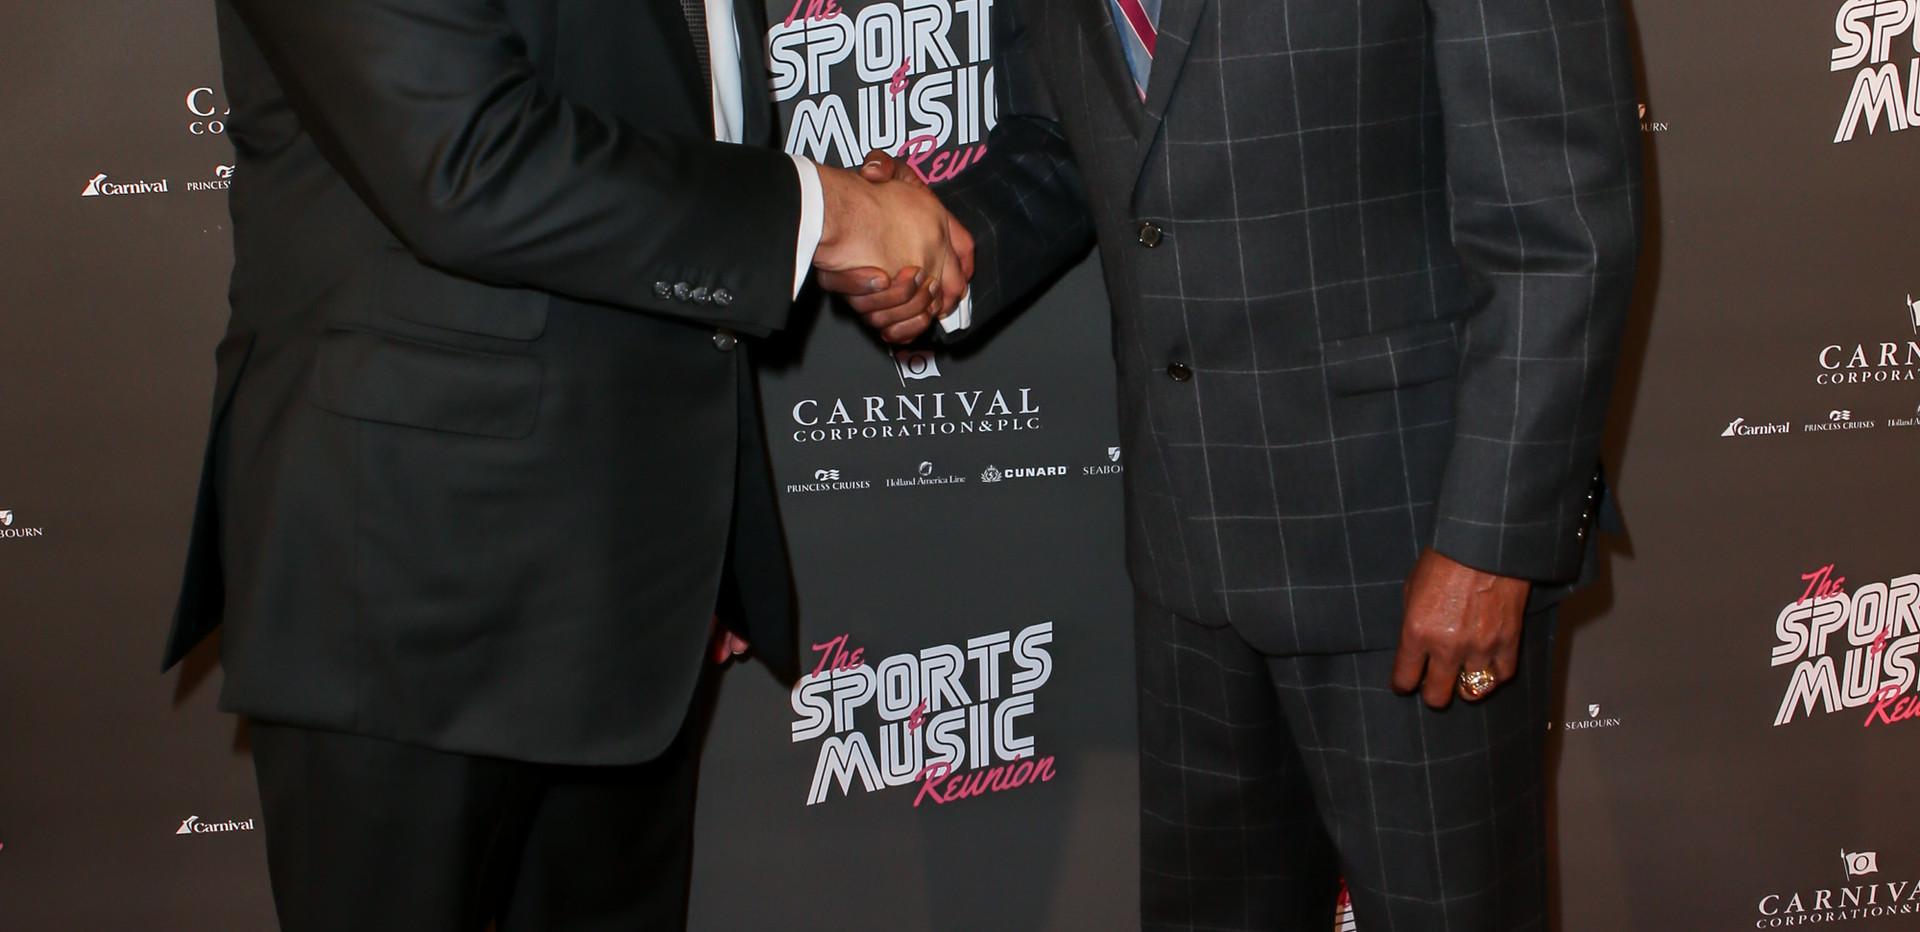 Arnold Donald & Jim Hill - Sports & Music Reunion